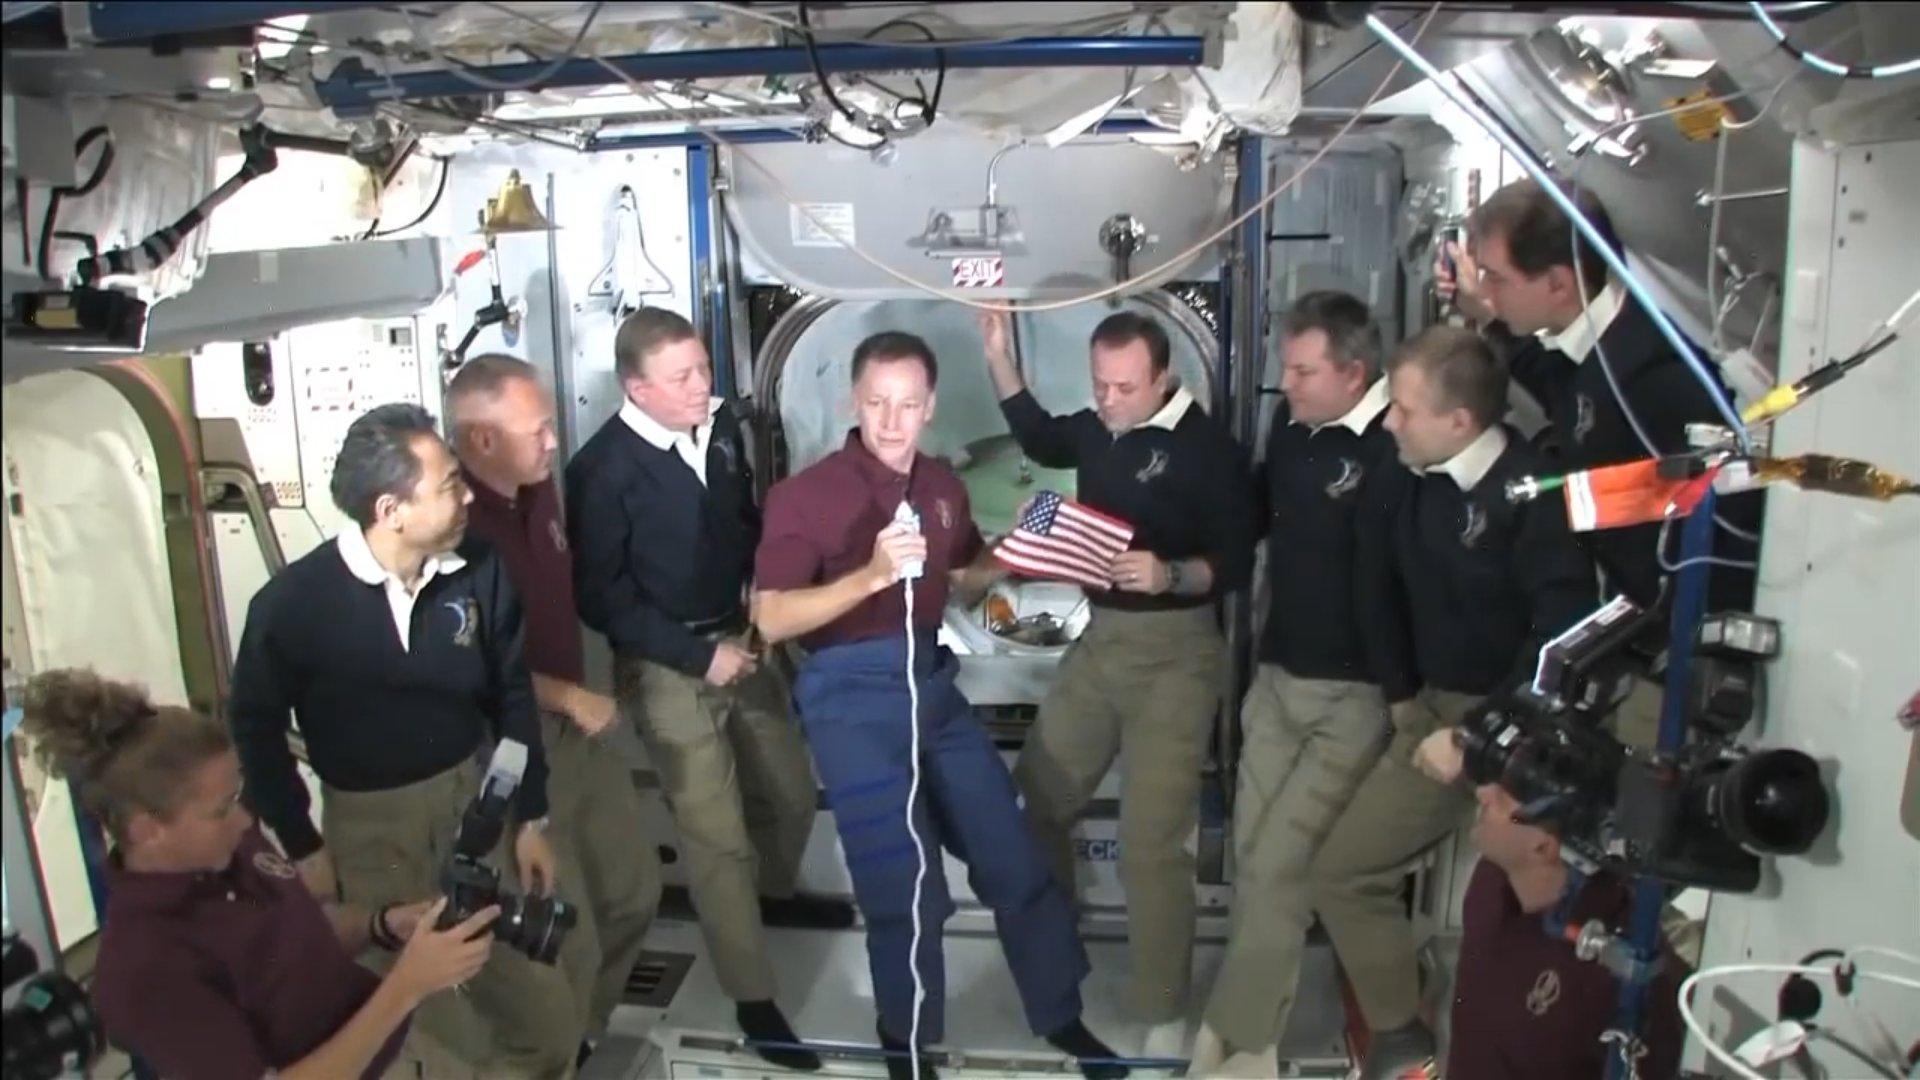 Даглас Херли заберет с МКС флаг, который оставил там 9 лет назад